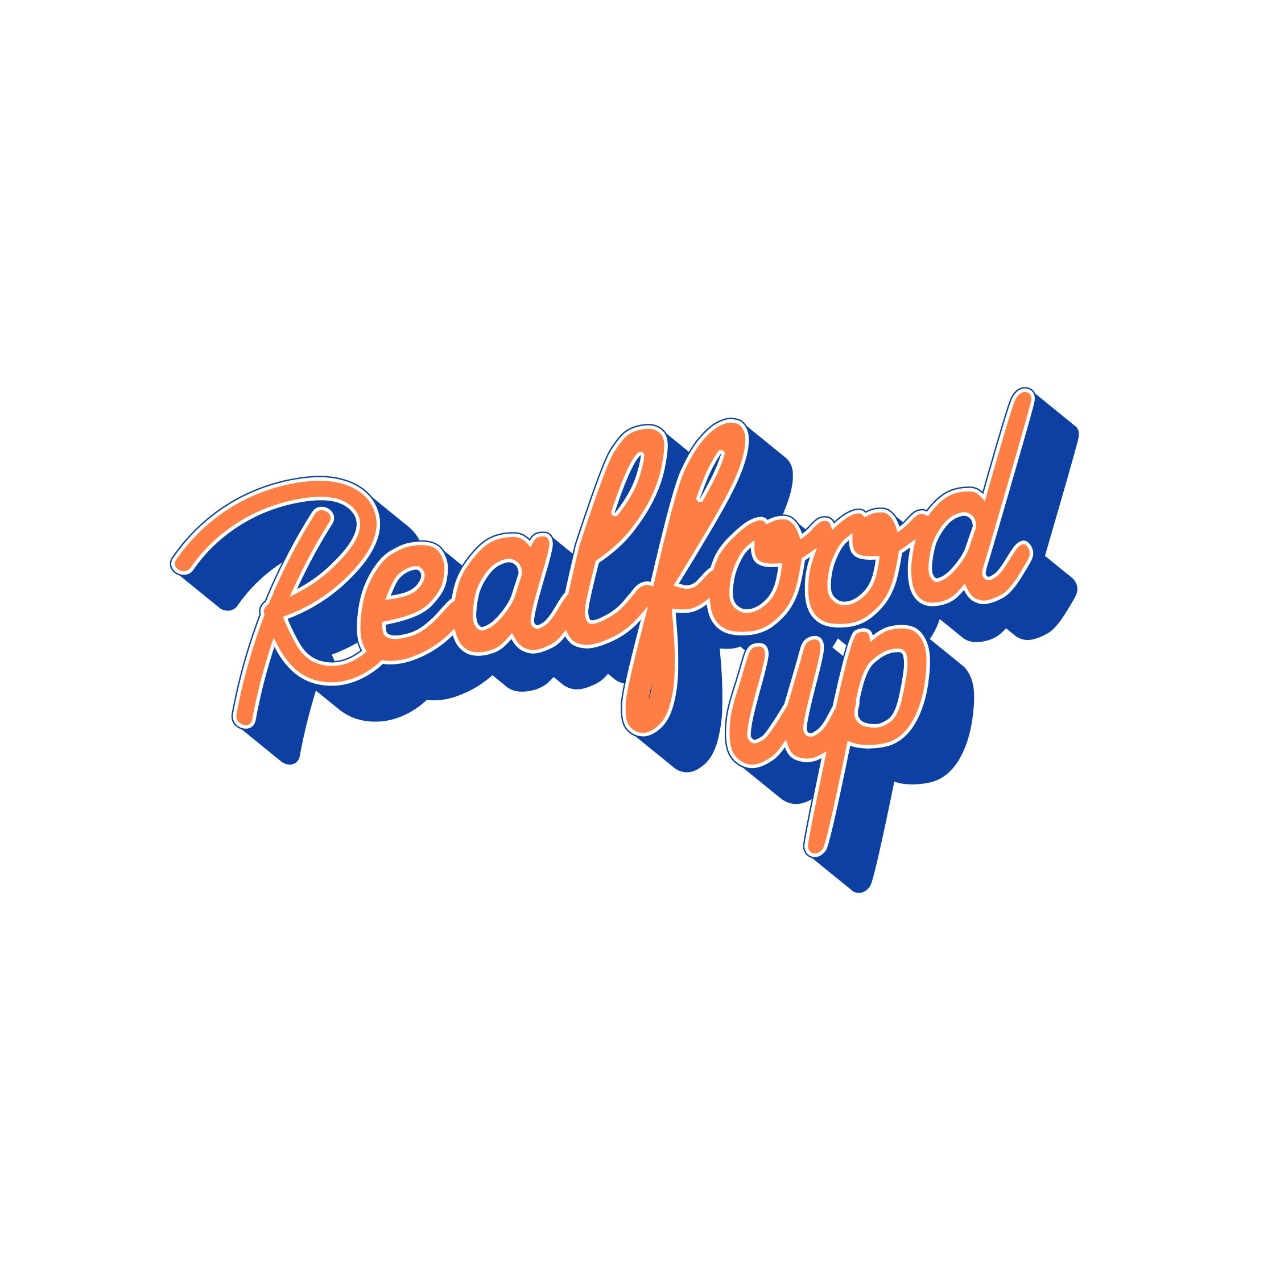 #RealfoodUp